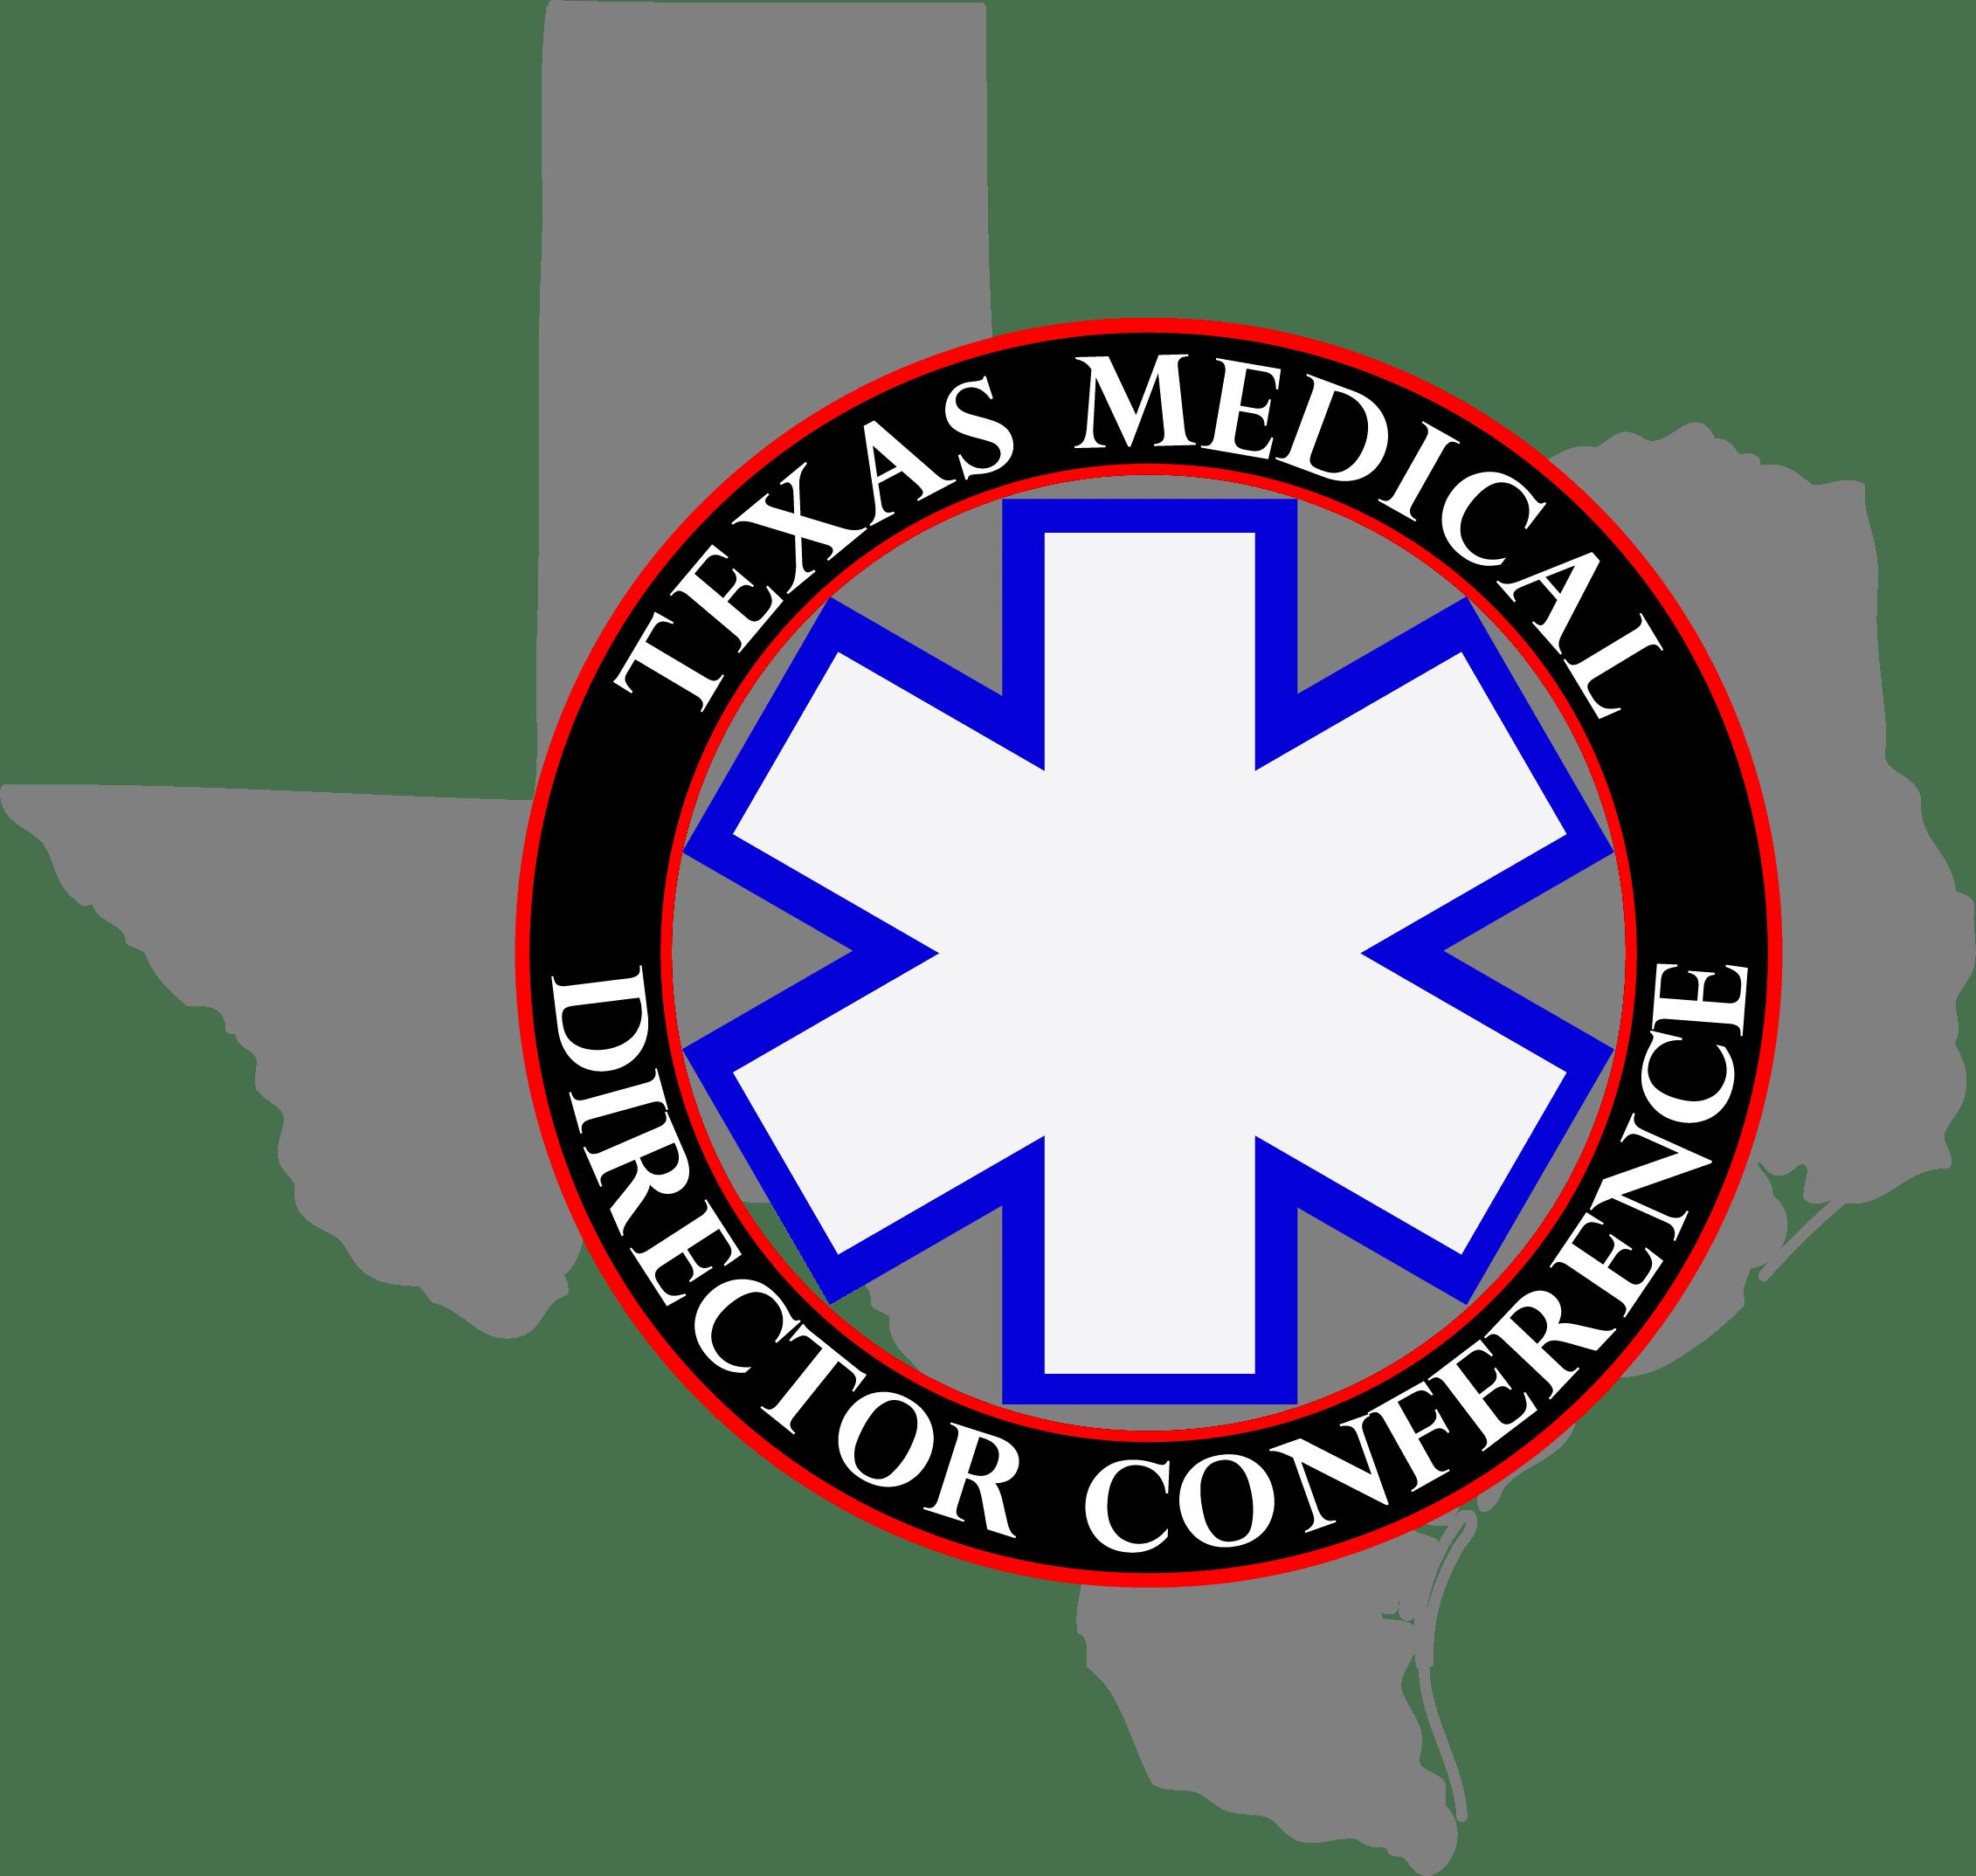 Texas Medical Director Conference Logo | Sladek Conference Services, Inc. | Lampasas, TX